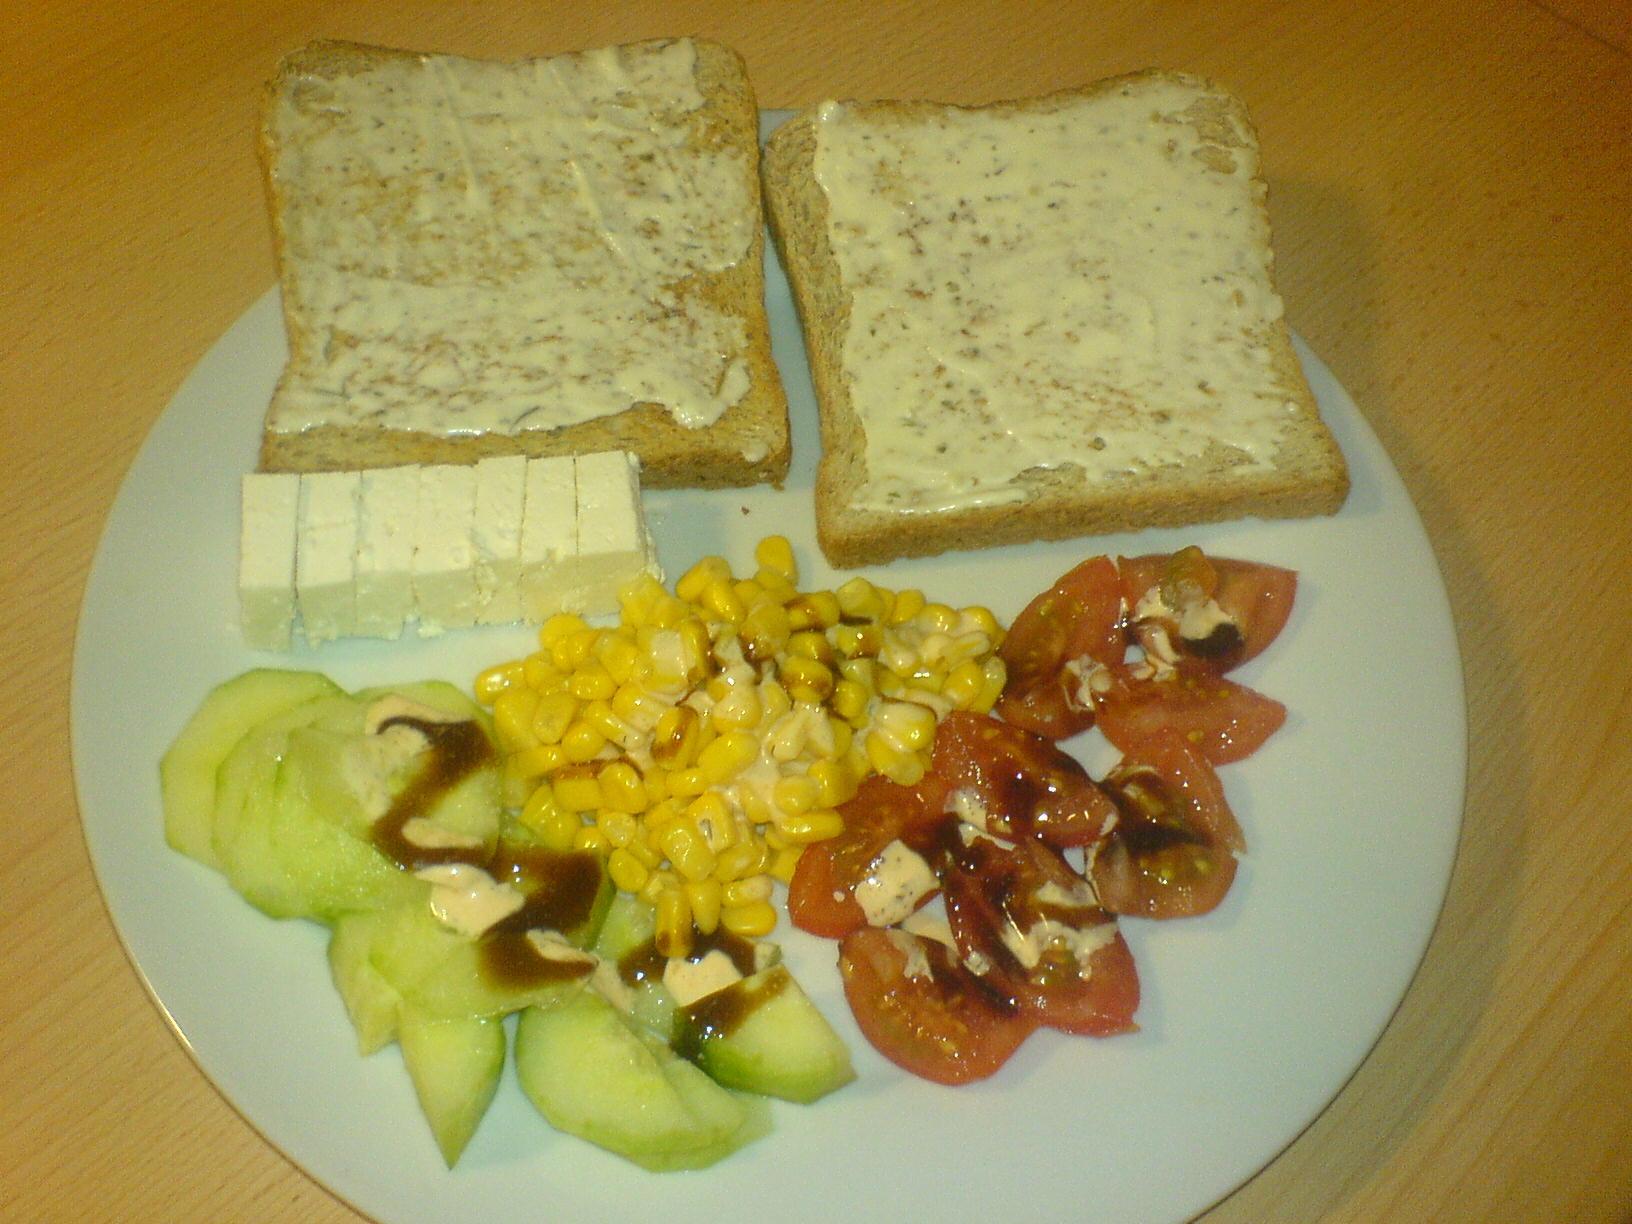 http://foodloader.net/Holz_2009-11-22_Remouladentoasts_mit_Salat.jpg